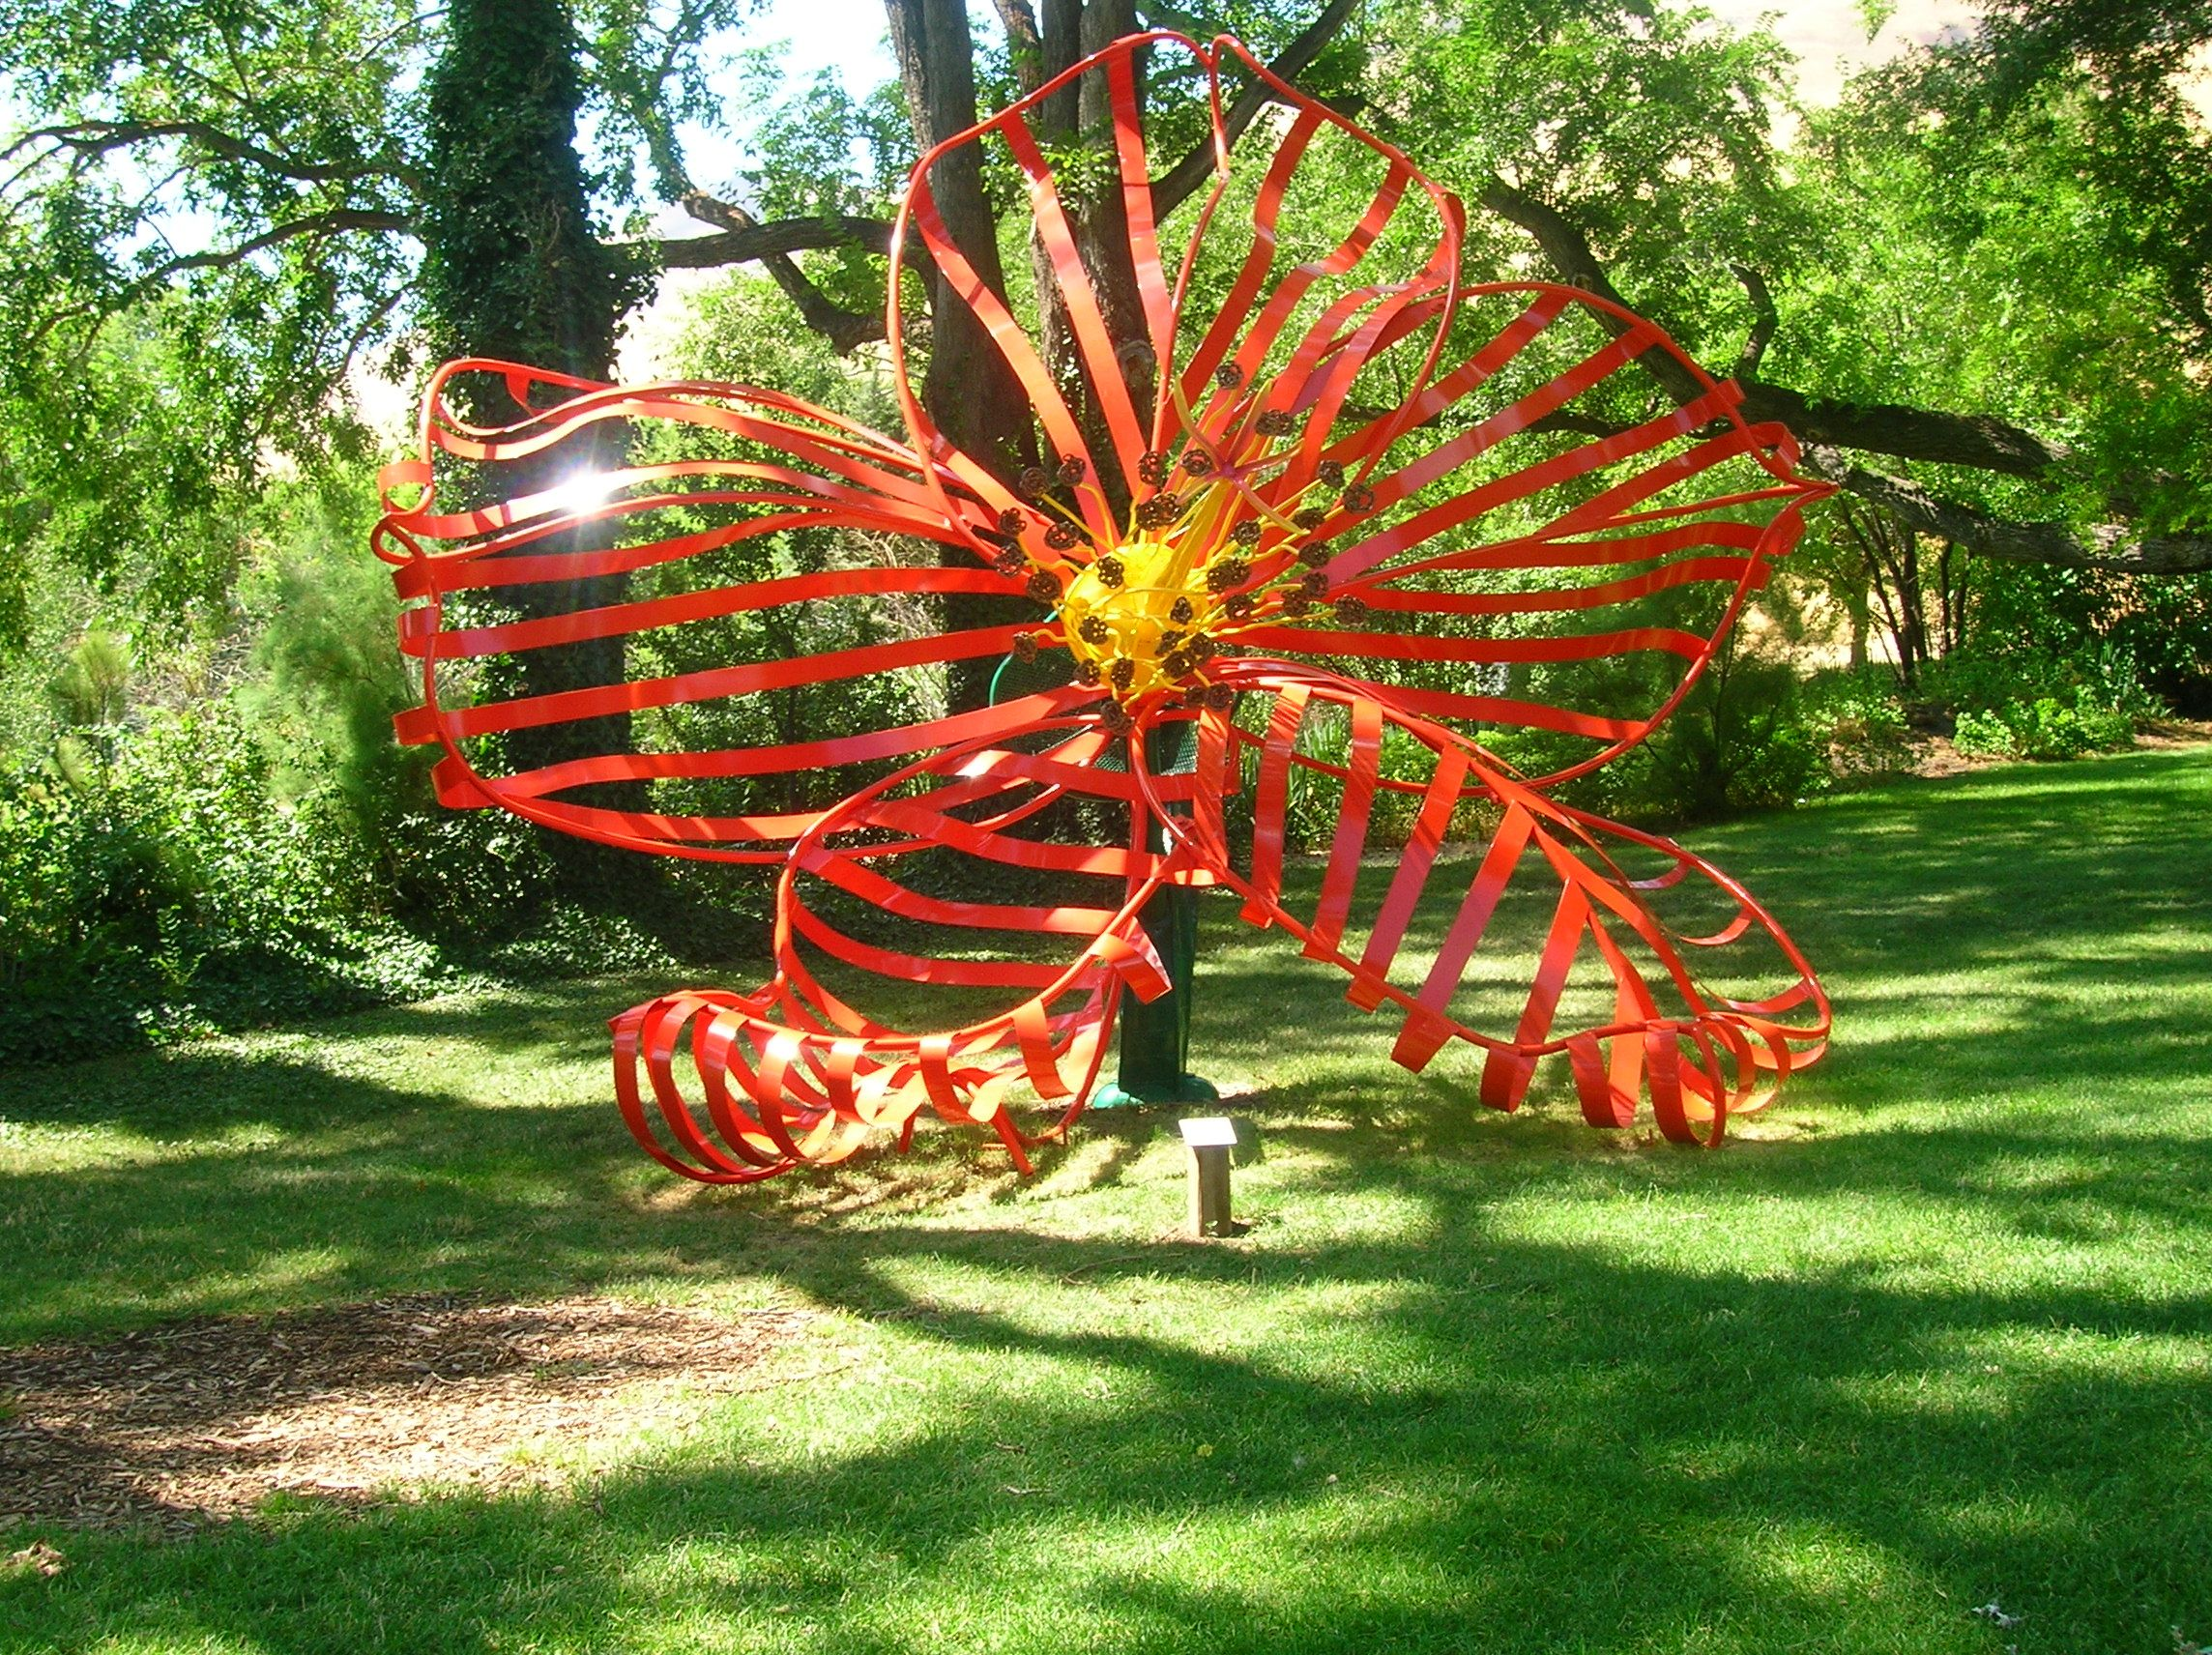 Matt Cartwright (Portland, Ore.), Malabar Bombax, 2009, powder-coated steel. Collection of Maryhill Museum of Art.